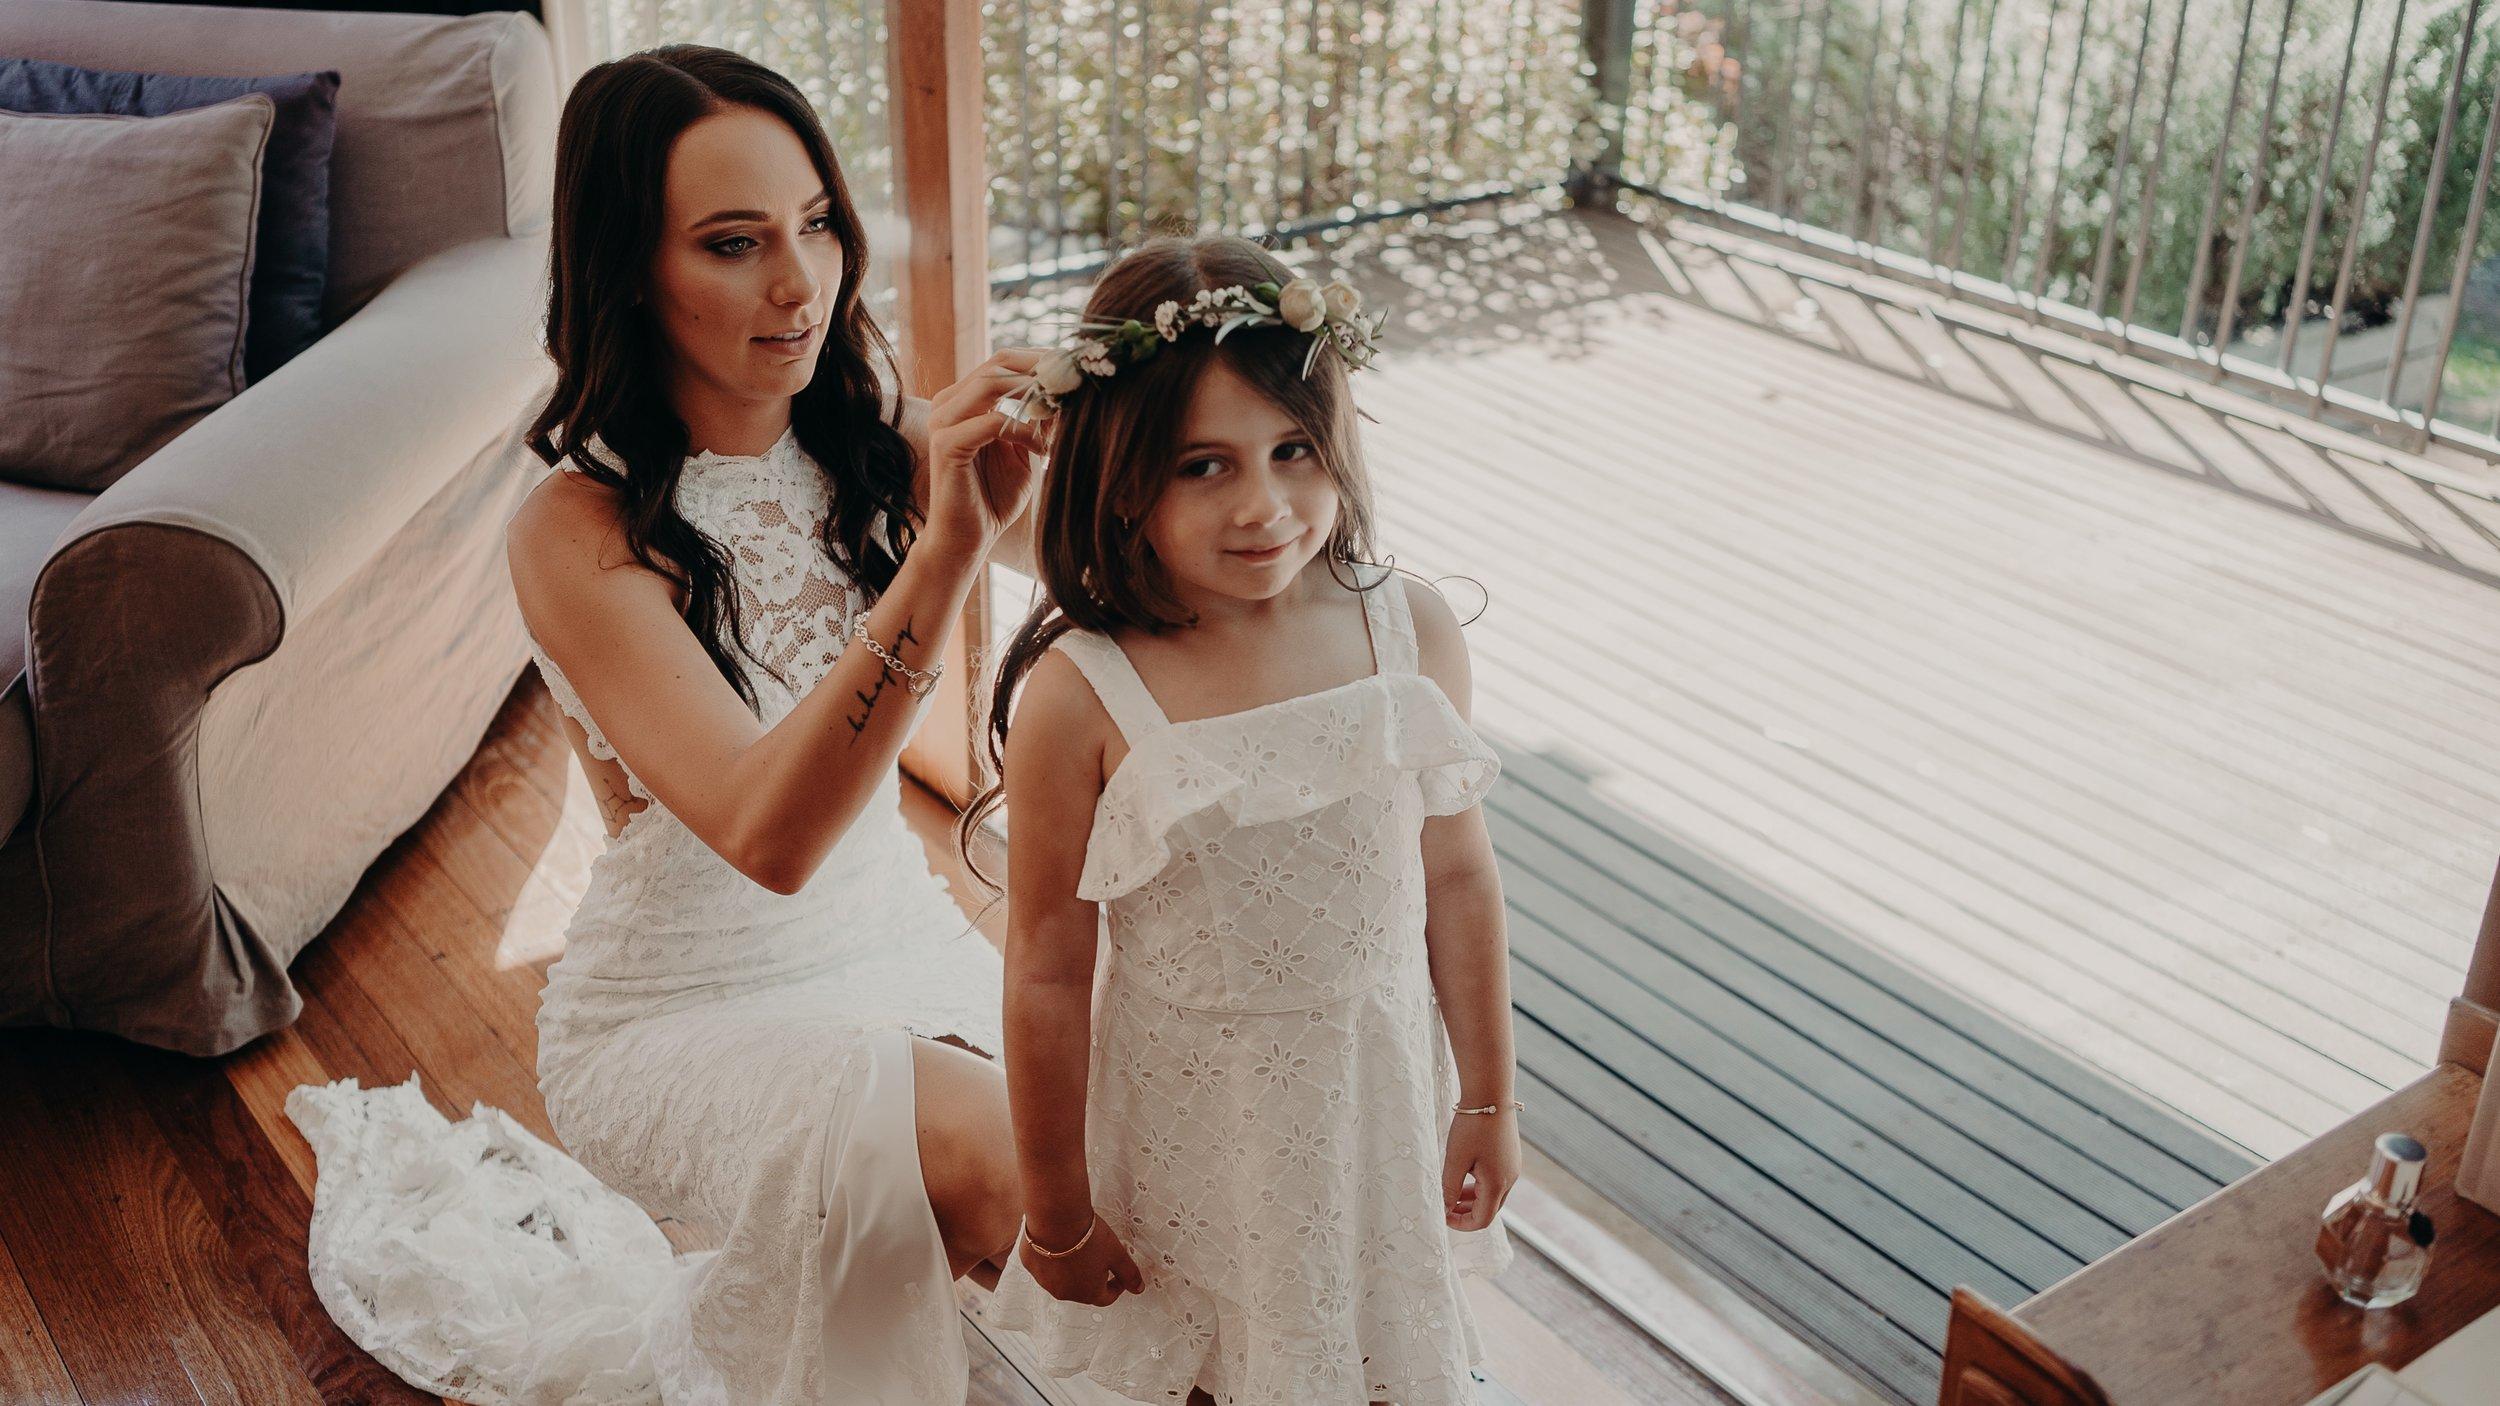 mickalathomas_puremacphotography_weddingphotographer_couplephotographer_Sheppartonphotographer_2708.jpg